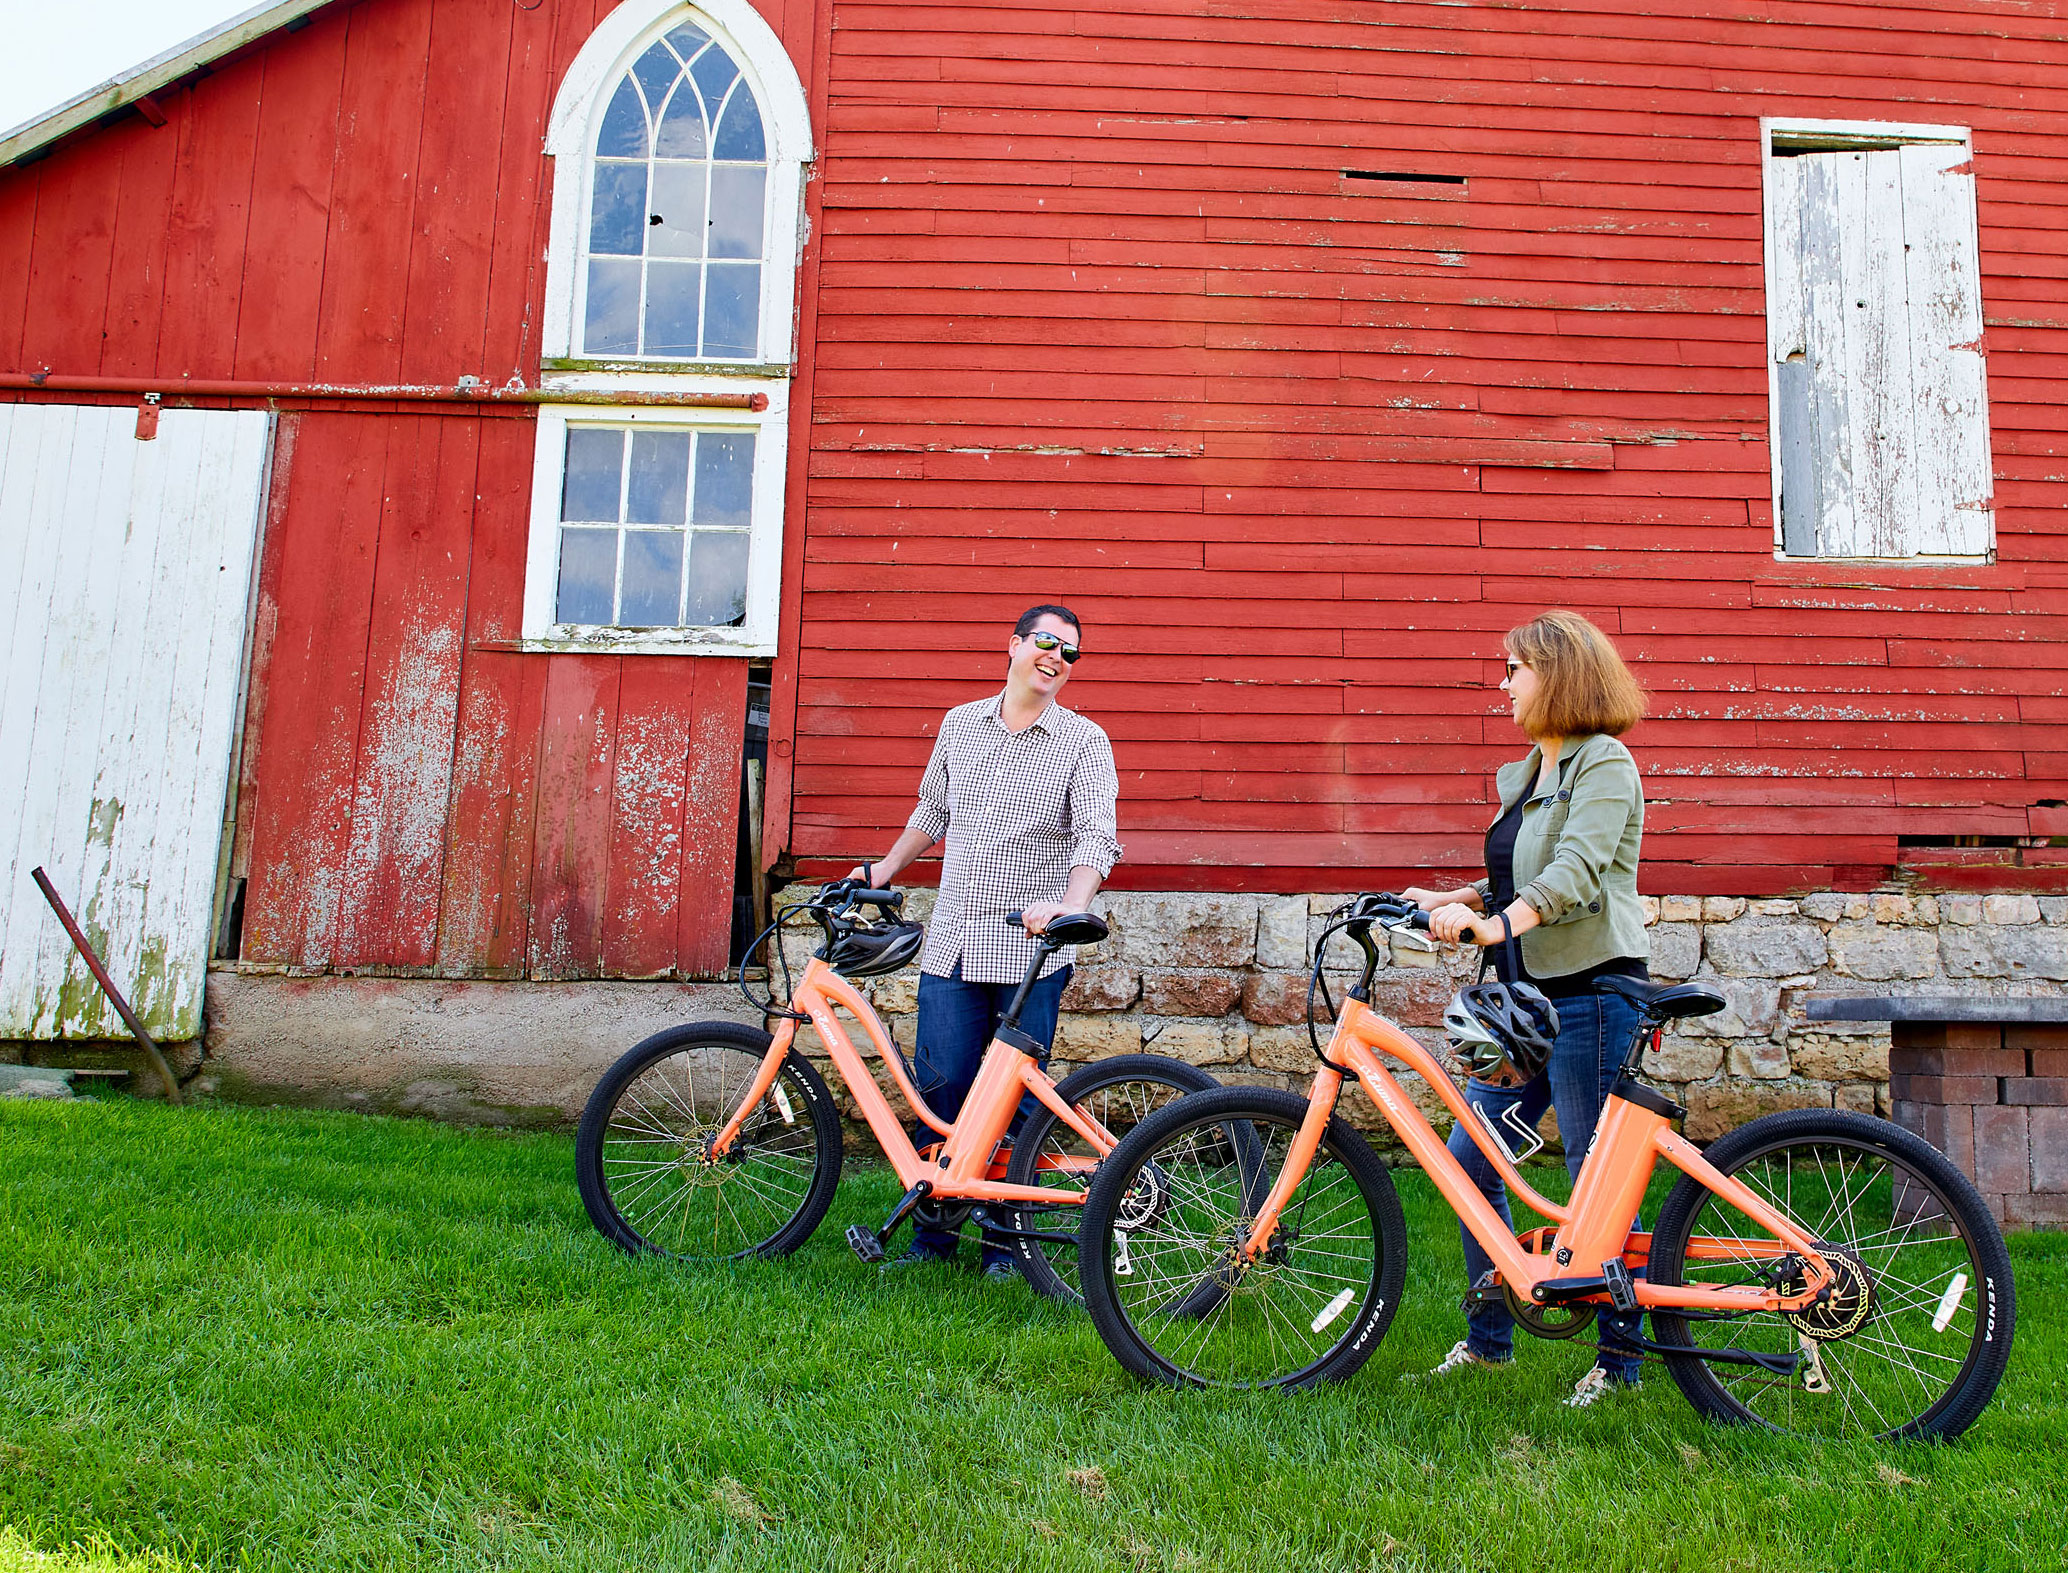 E-Bike Ride Through The Countryside